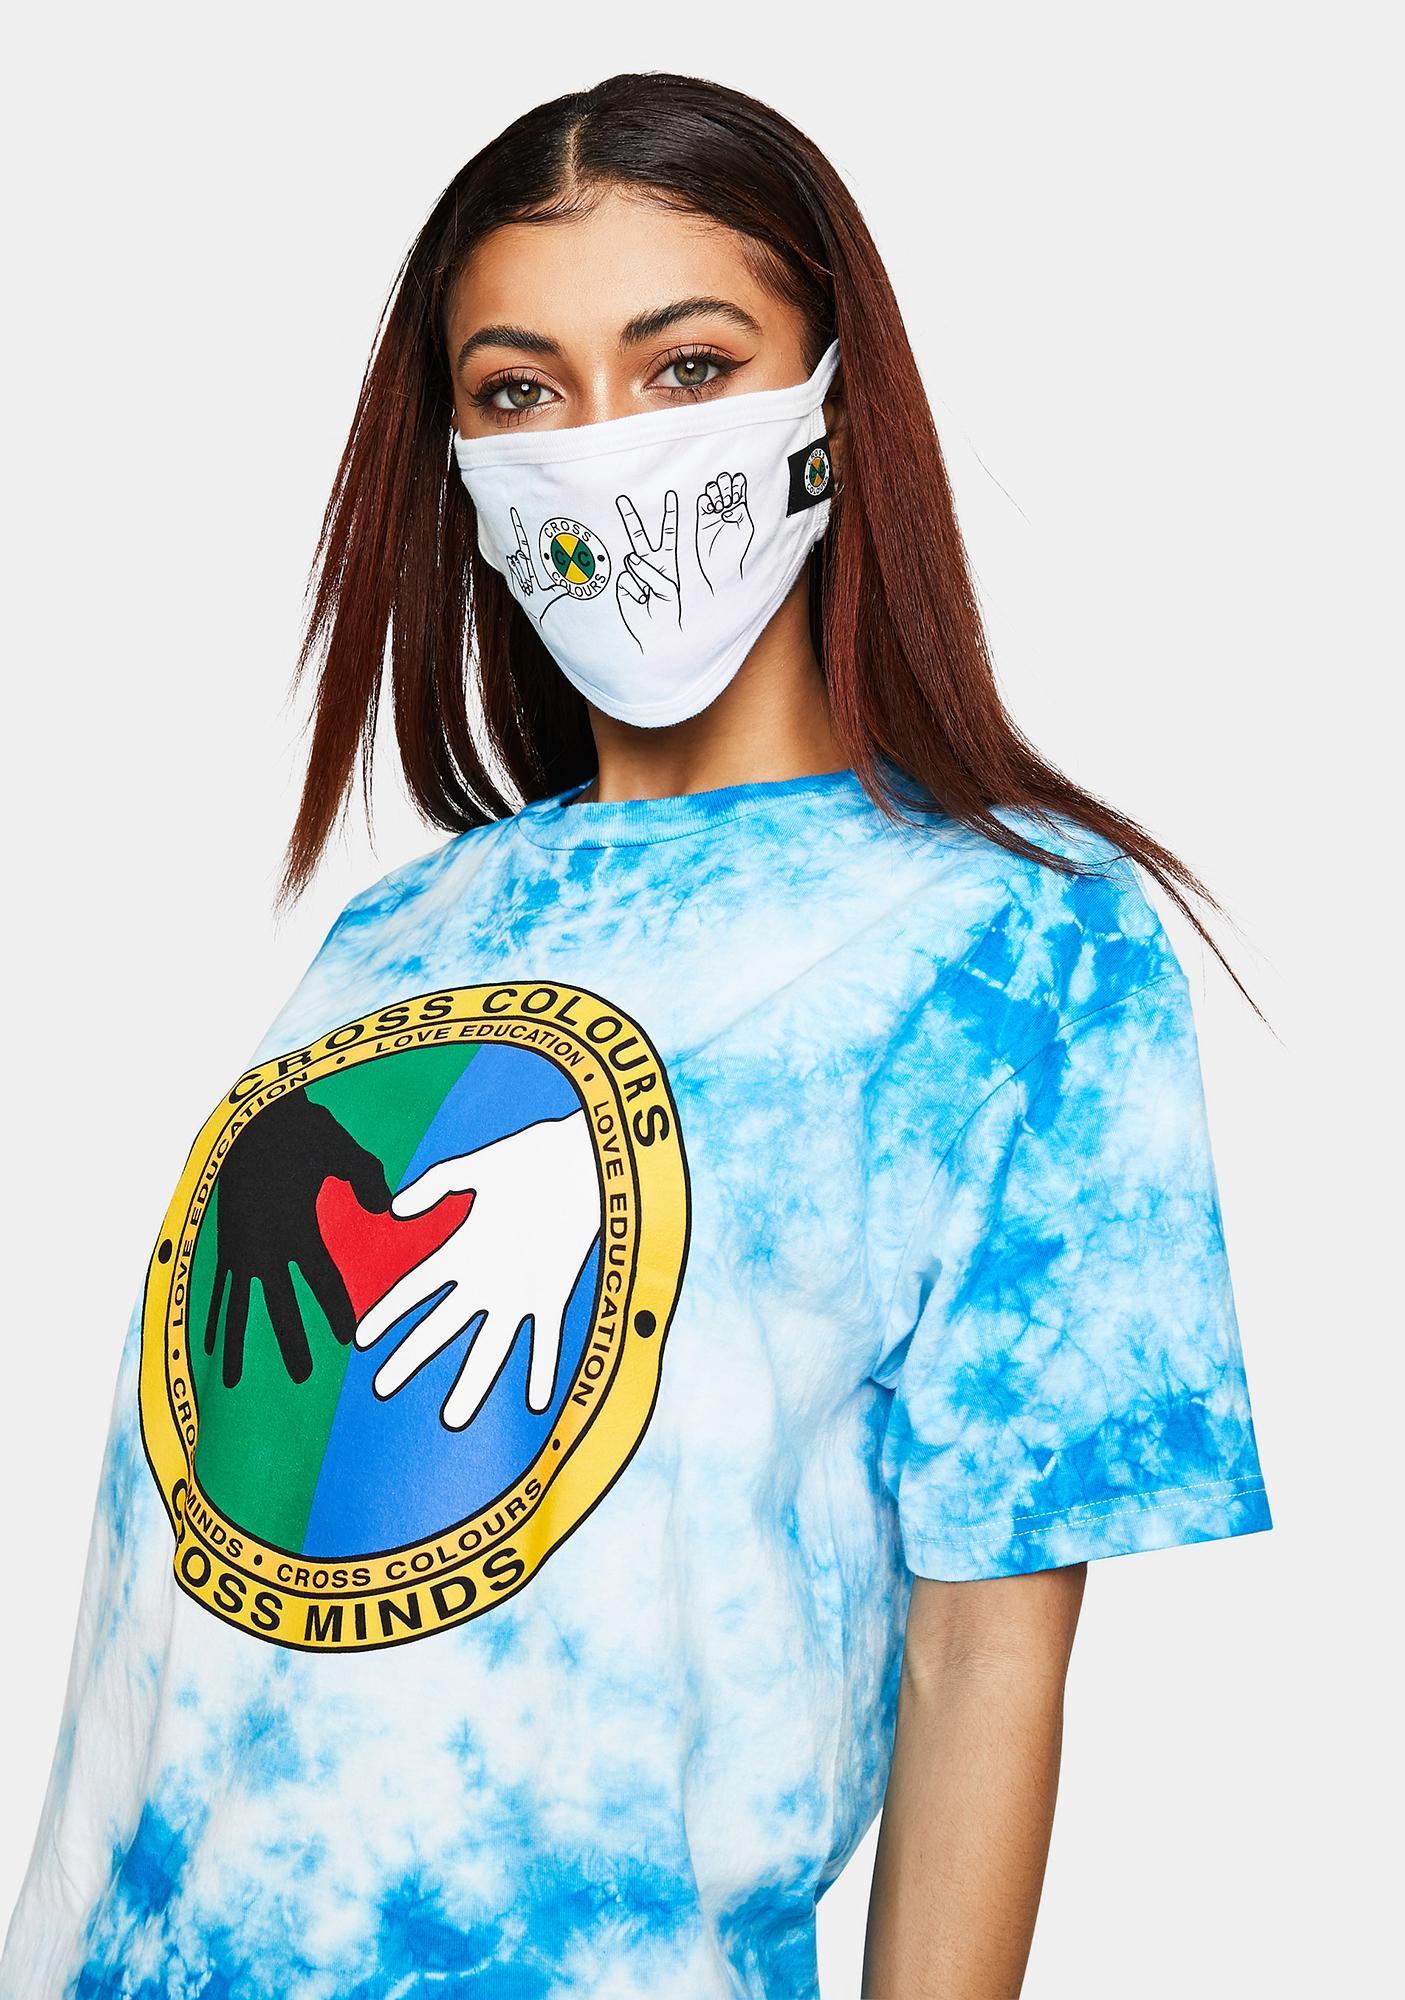 Cross Colours Cross Minds Tie Dye T-Shirt